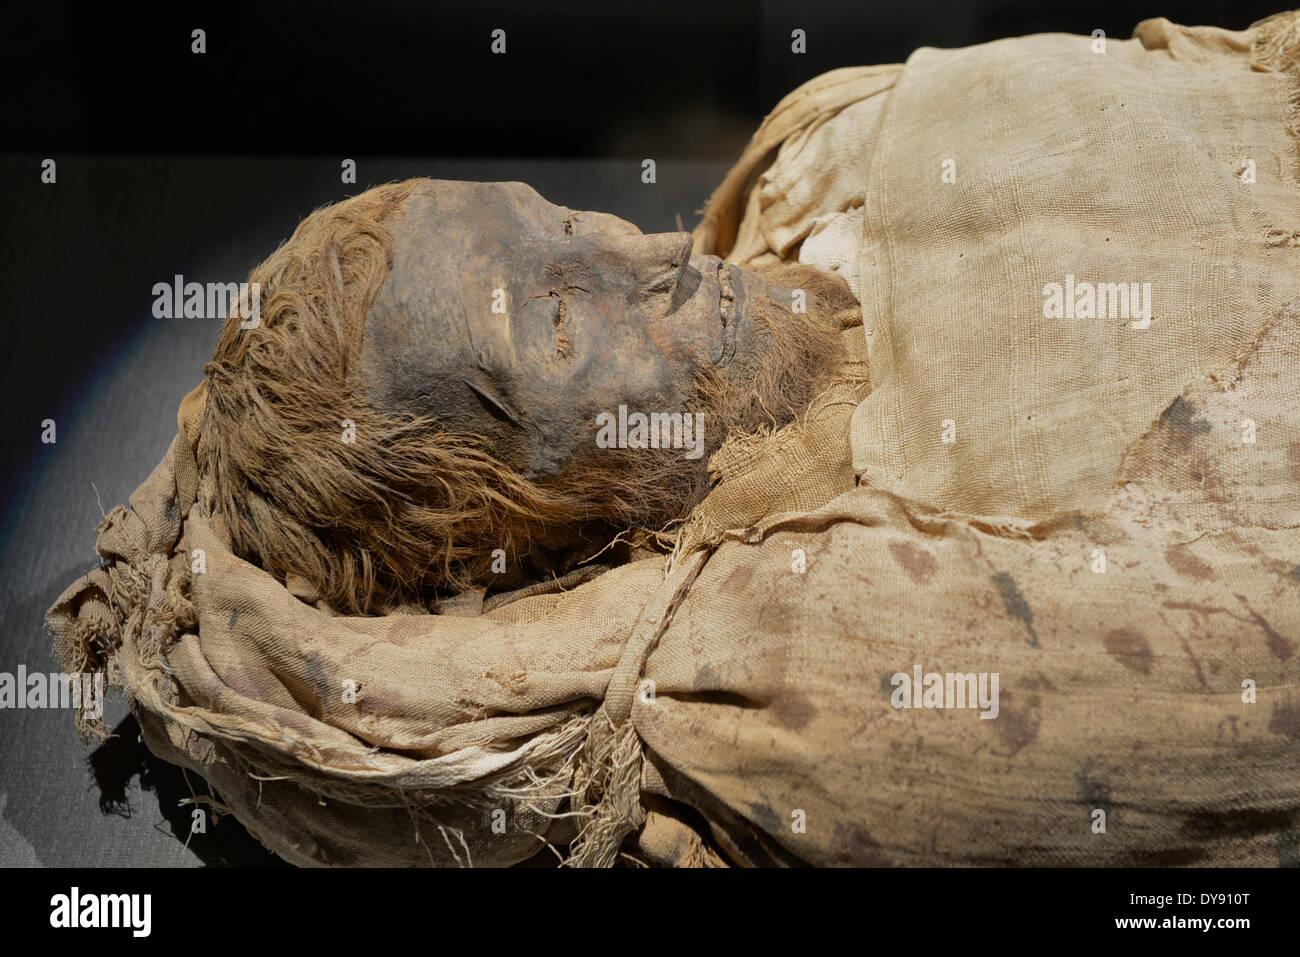 USA United States America Texas Houston Museum of Natural Science Museum Natural Science Hall of Ancient Egypt mummy Egypt - Stock Image